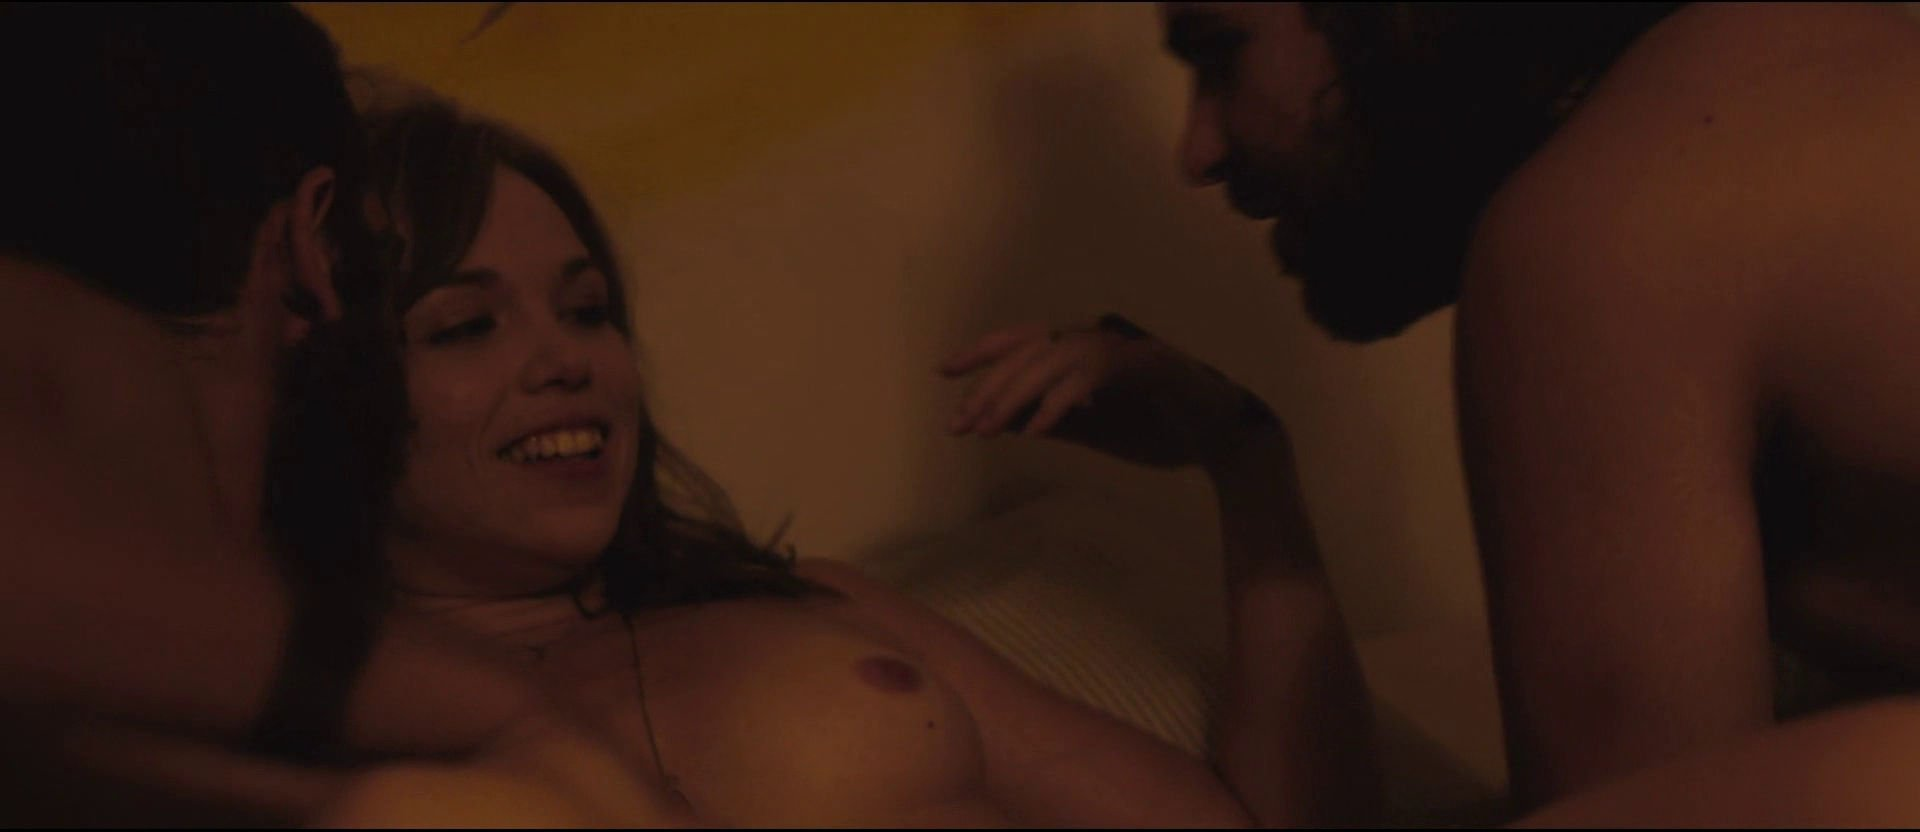 Linda blair nude fakes